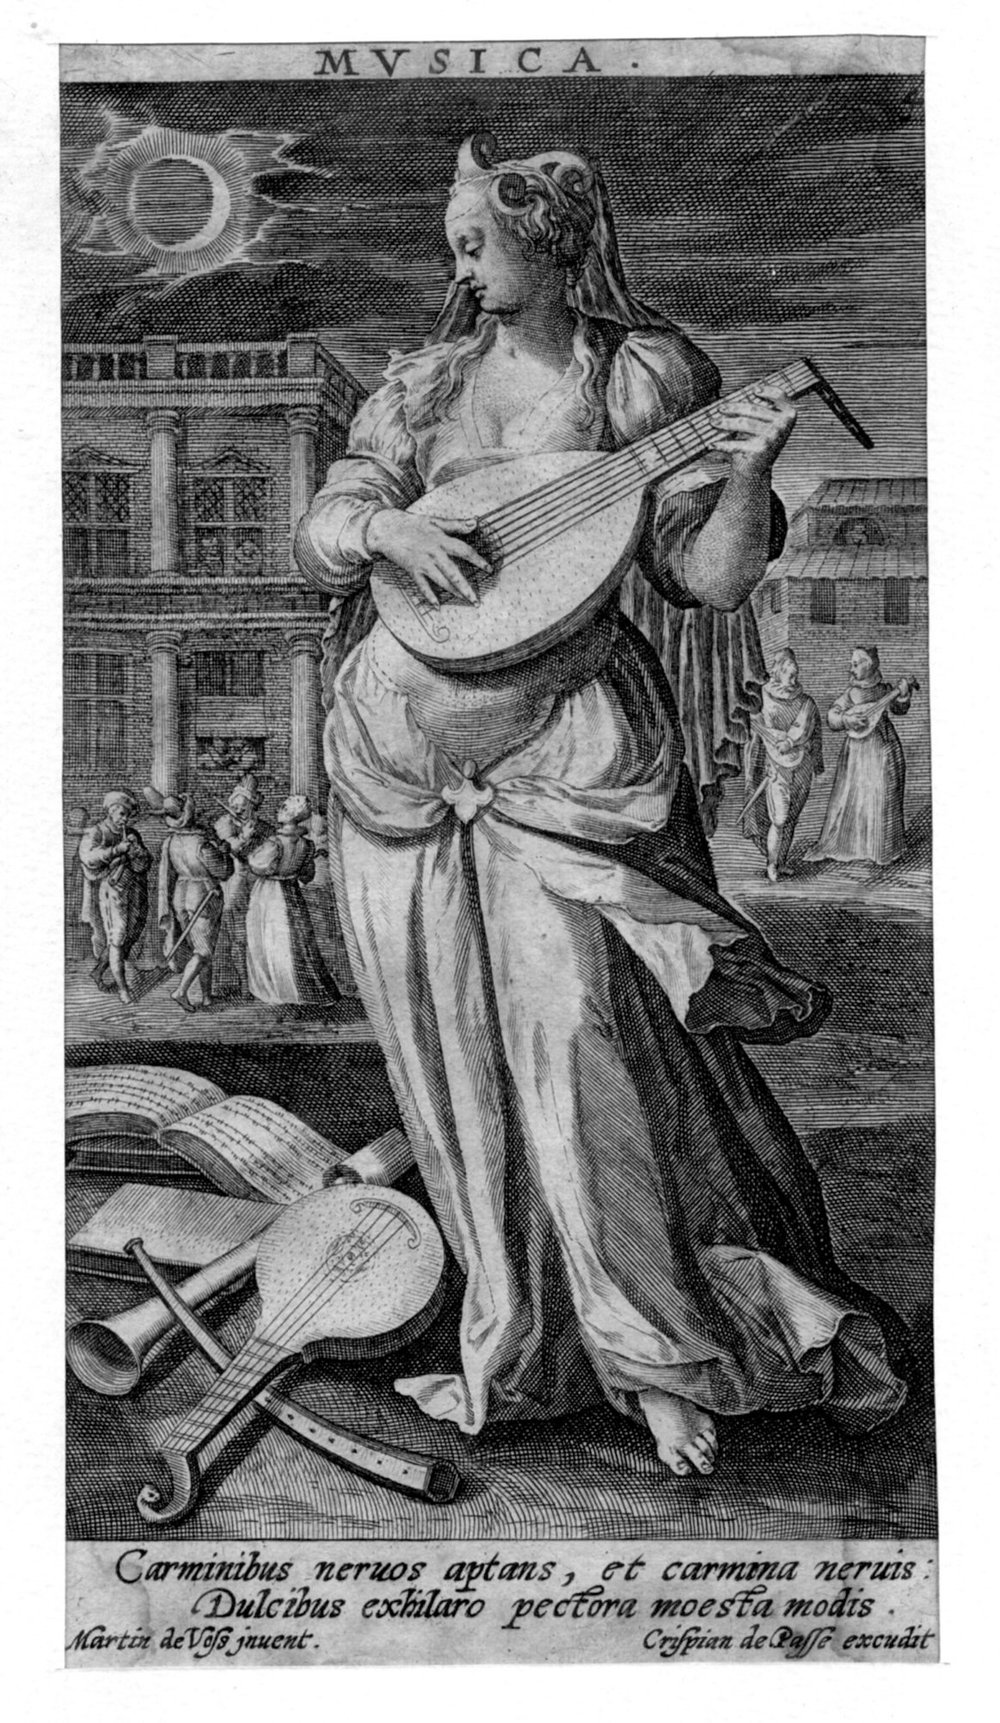 Martijn de Vos and Crispian de Passe, Musica